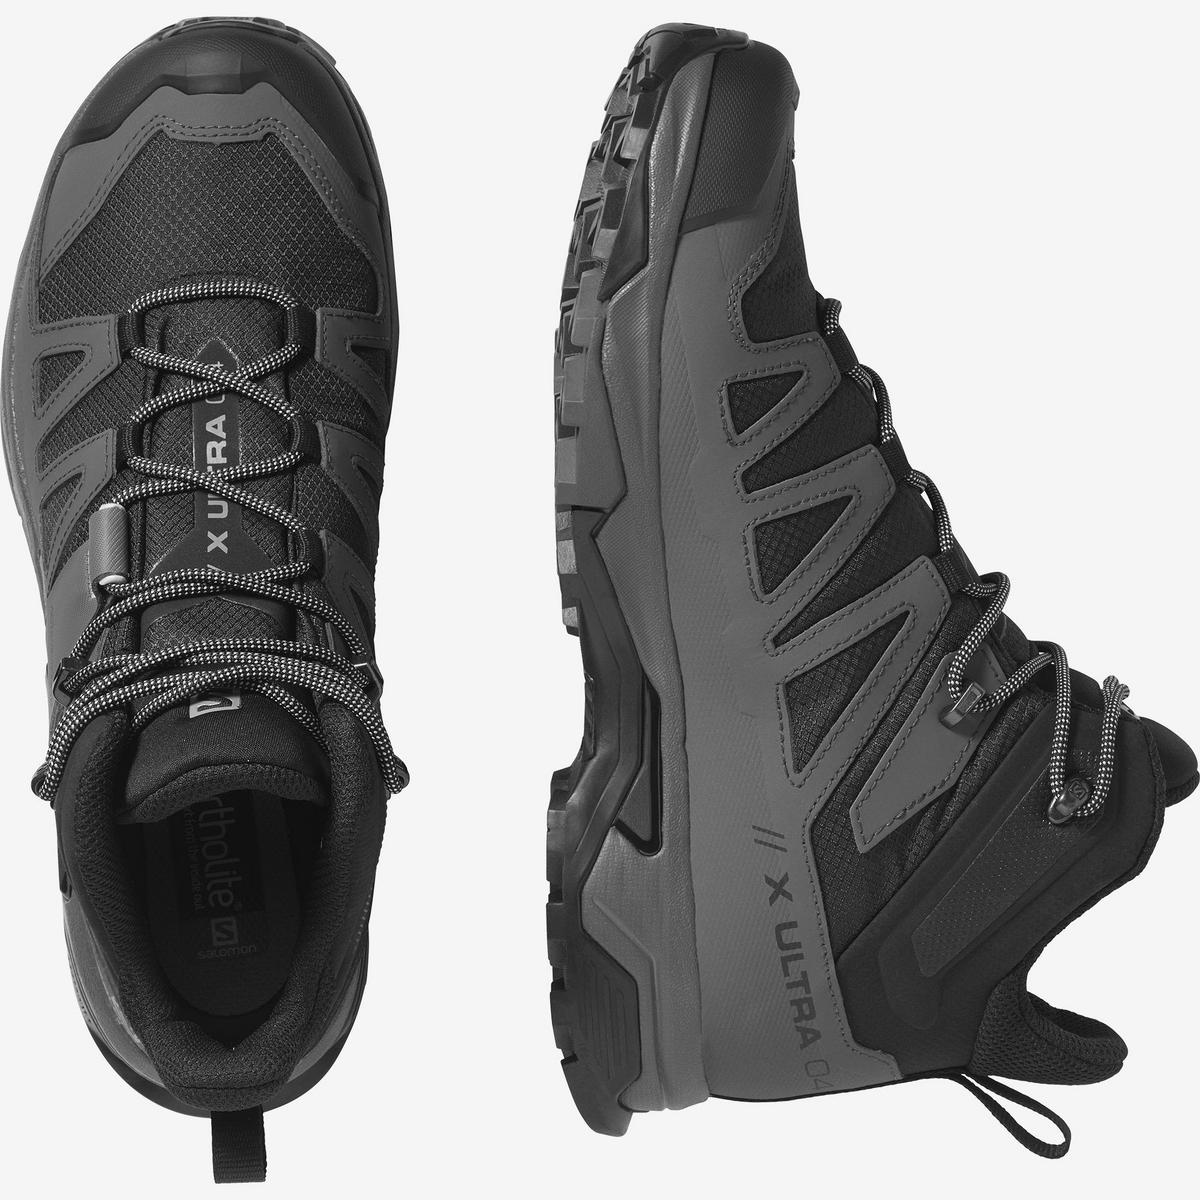 Salomon Men's X Ultra 4 Mid GTX - Magnet Black